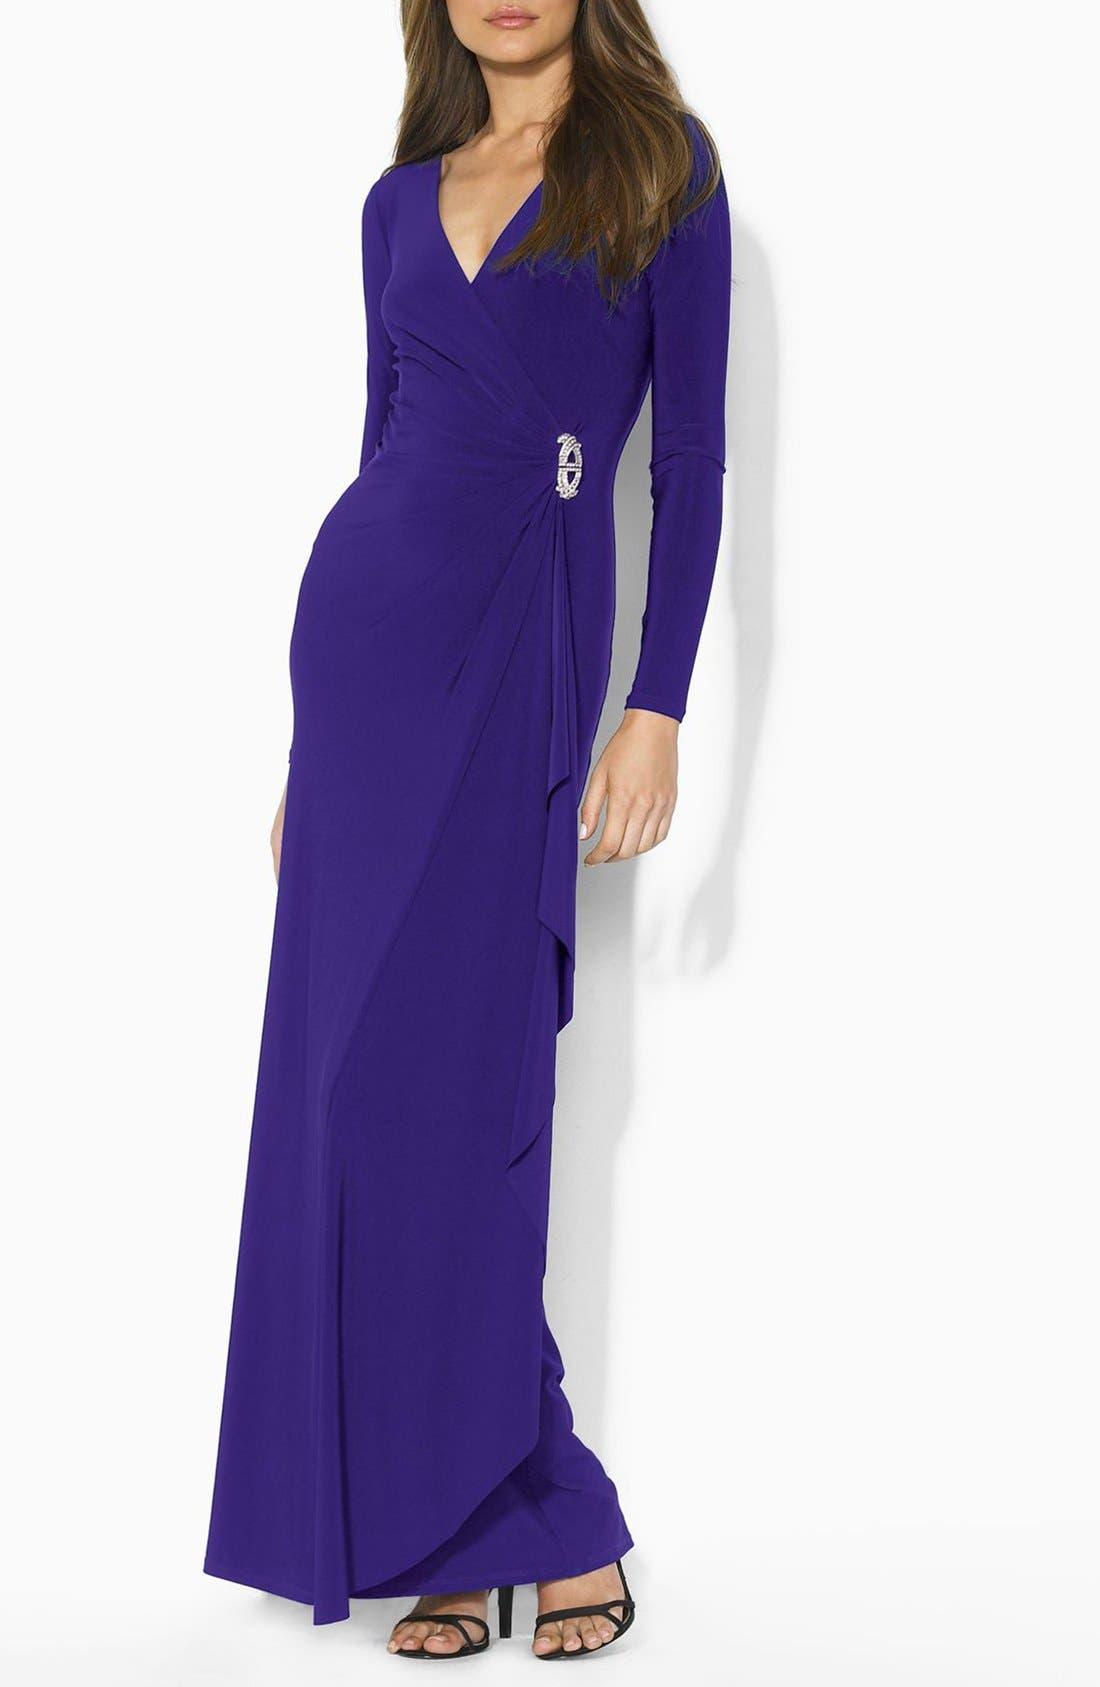 Alternate Image 1 Selected - Lauren Ralph Lauren Embellished Jersey Faux Wrap Gown (Regular & Petite)